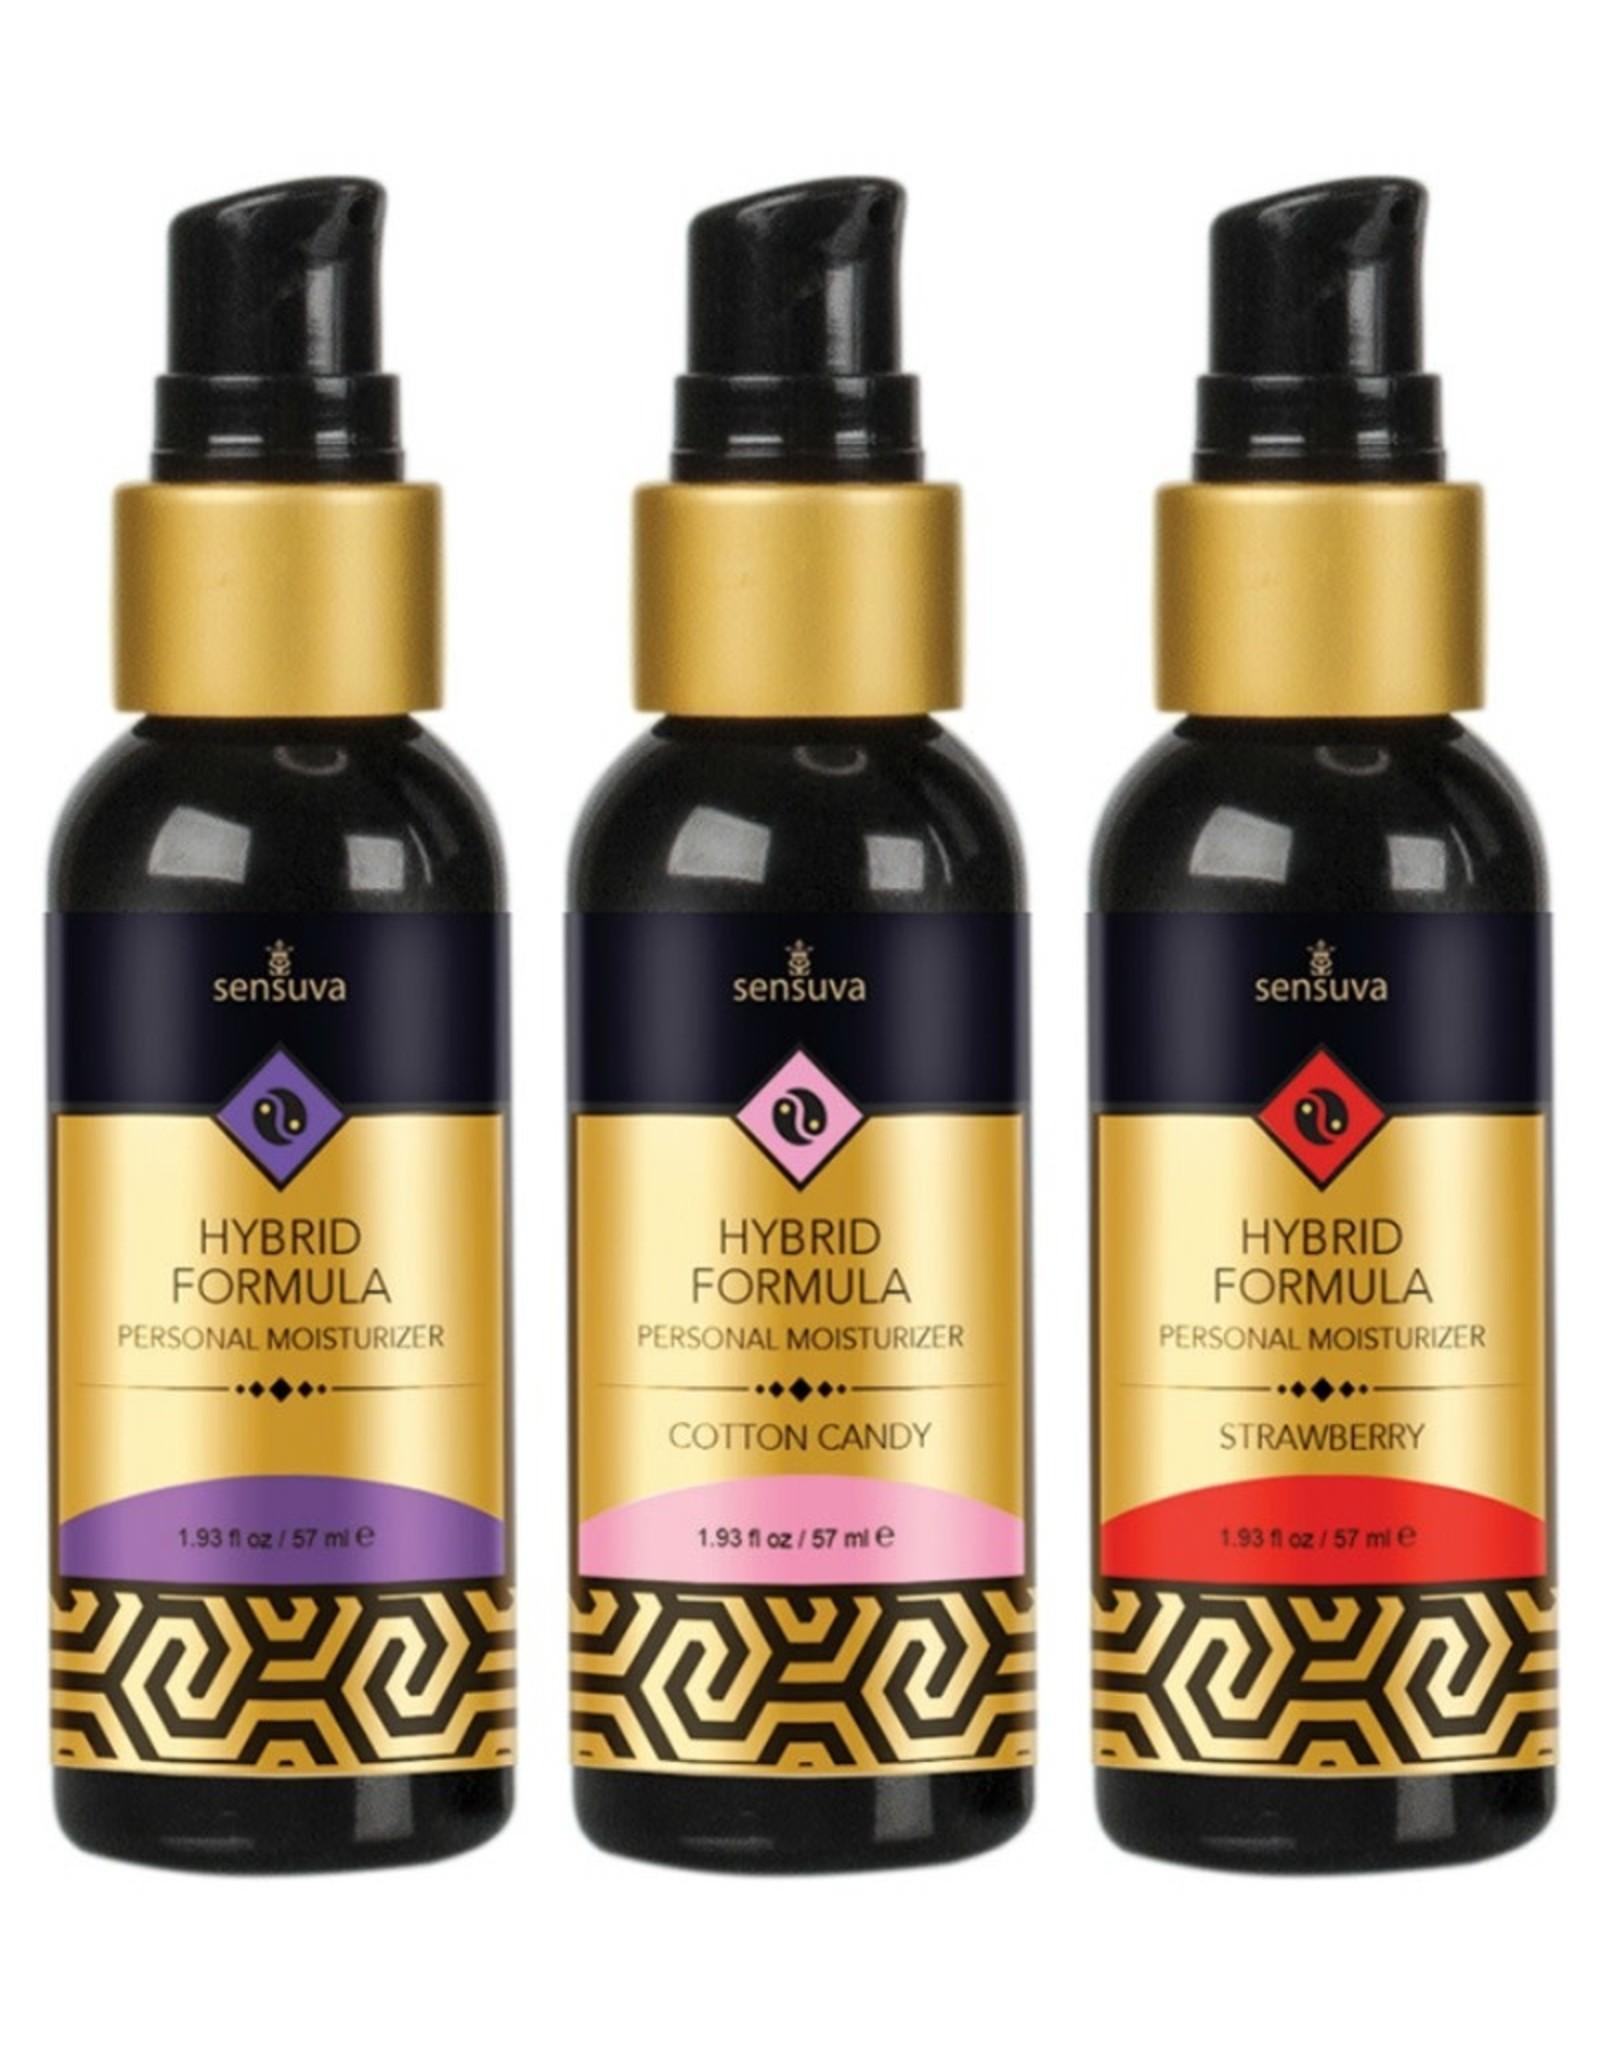 Sensuva On! hybrid formula personal moisturizer